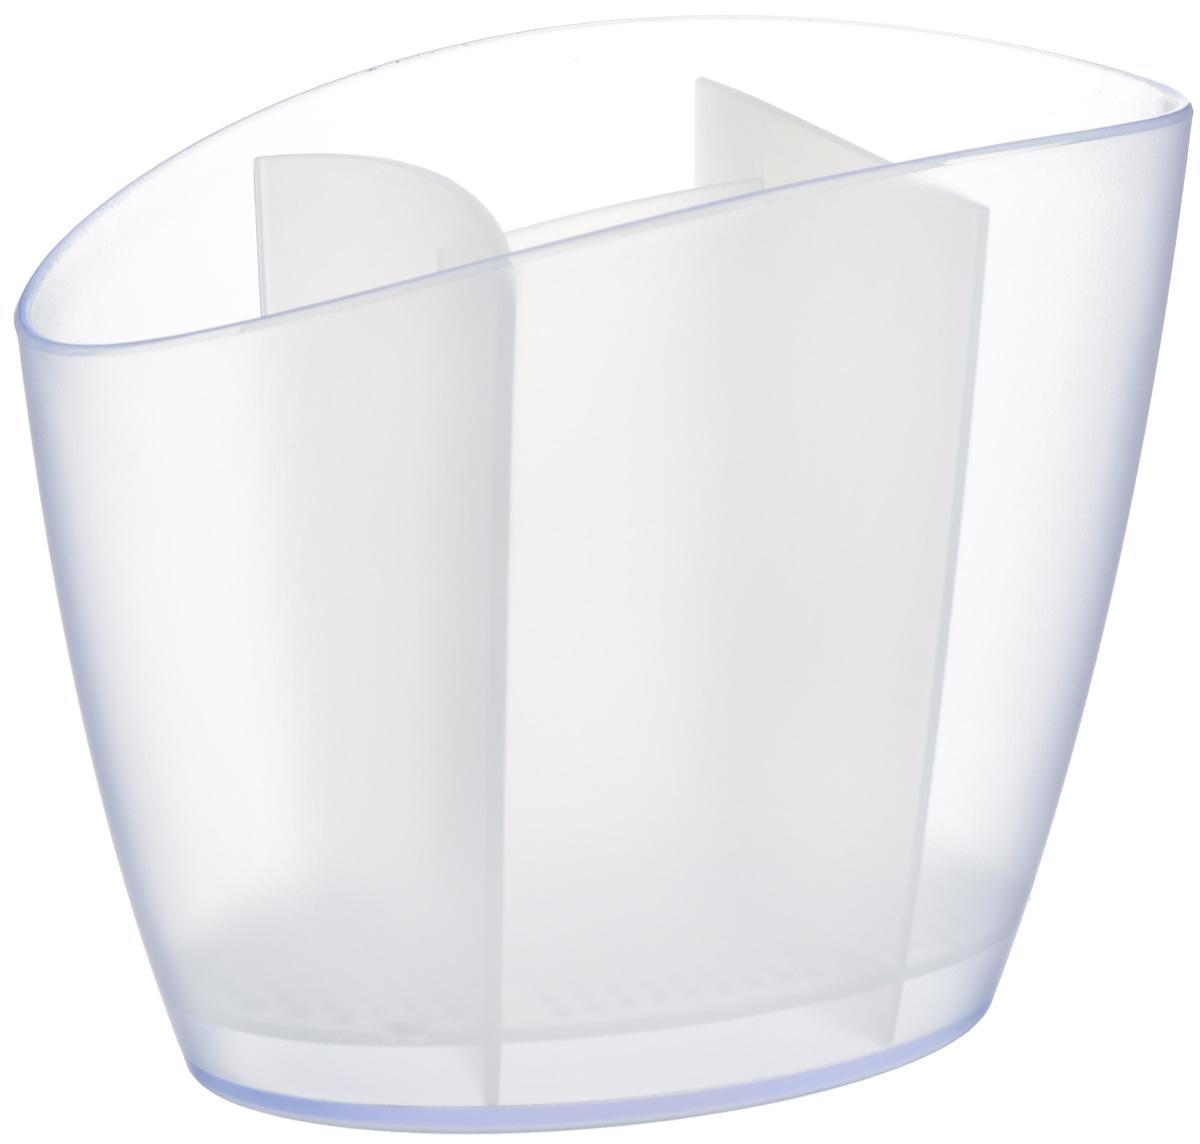 "Сушилка для столовых приборов Tescoma ""Clean Kit"", цвет: белый, 19,5 х 11 х 15,5 см"